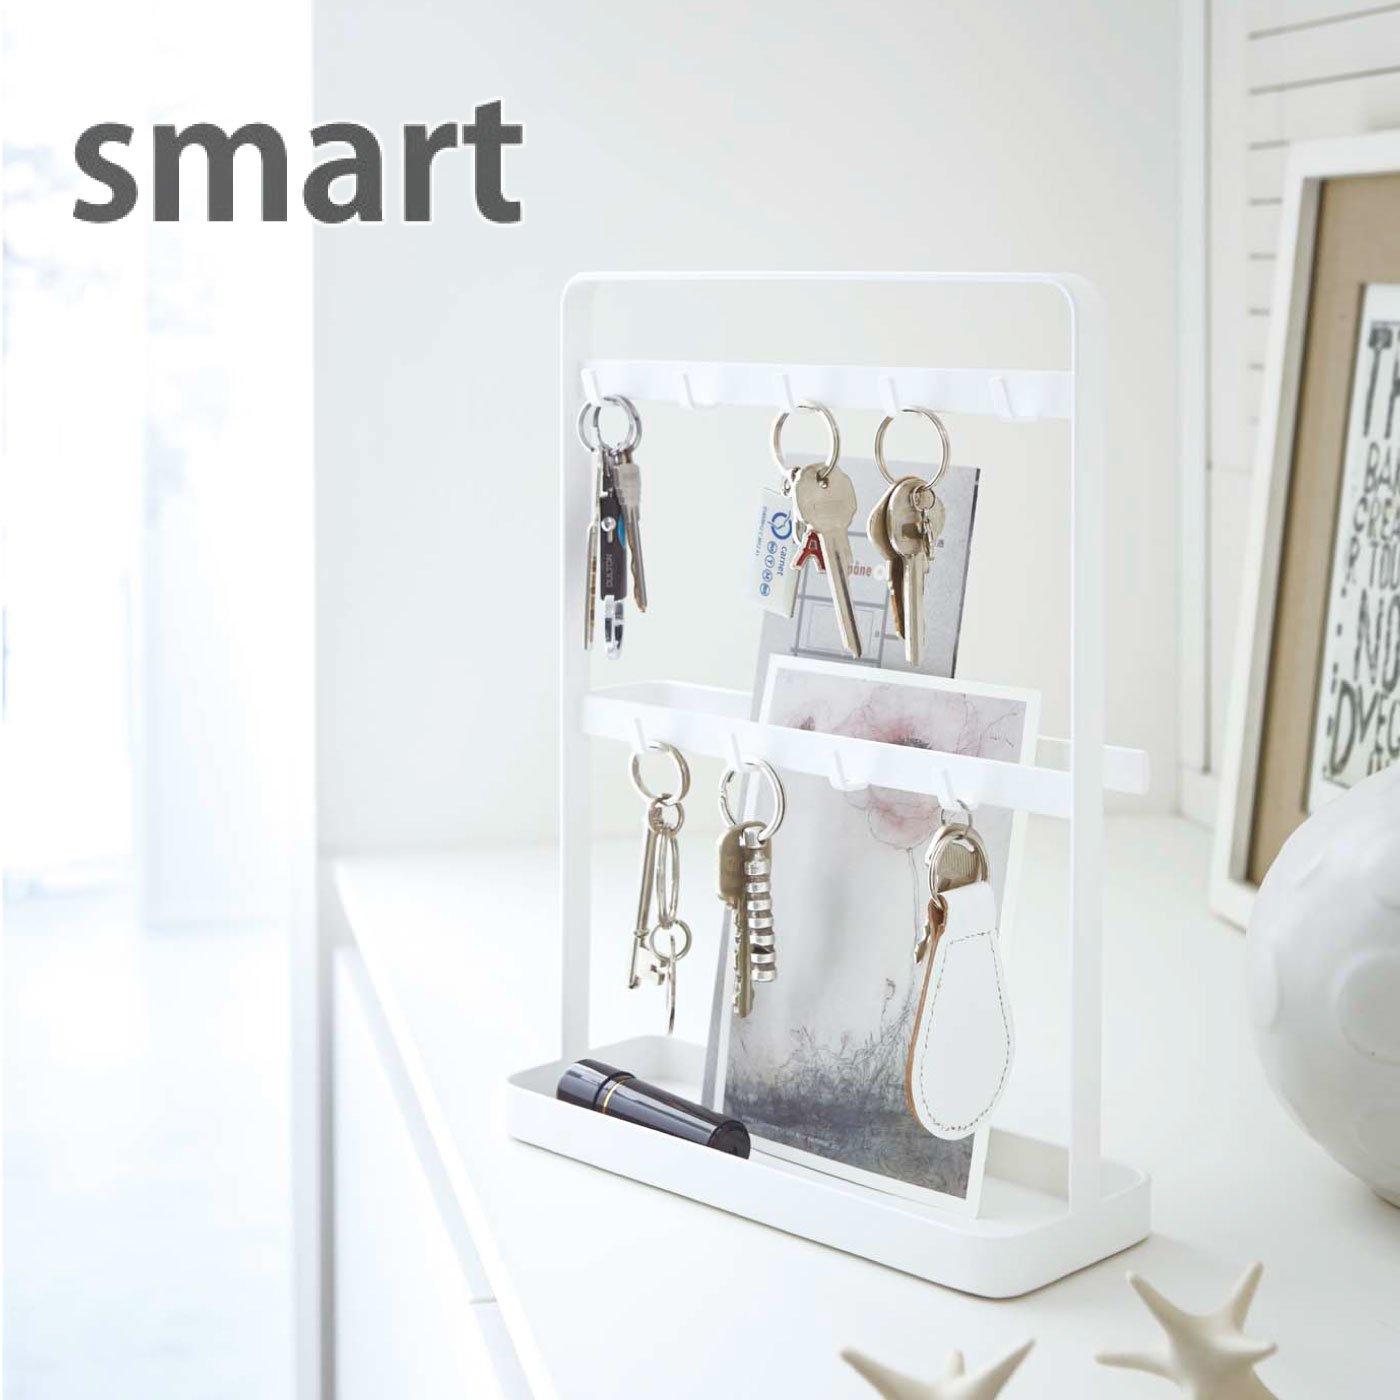 smart キーフックスタンド